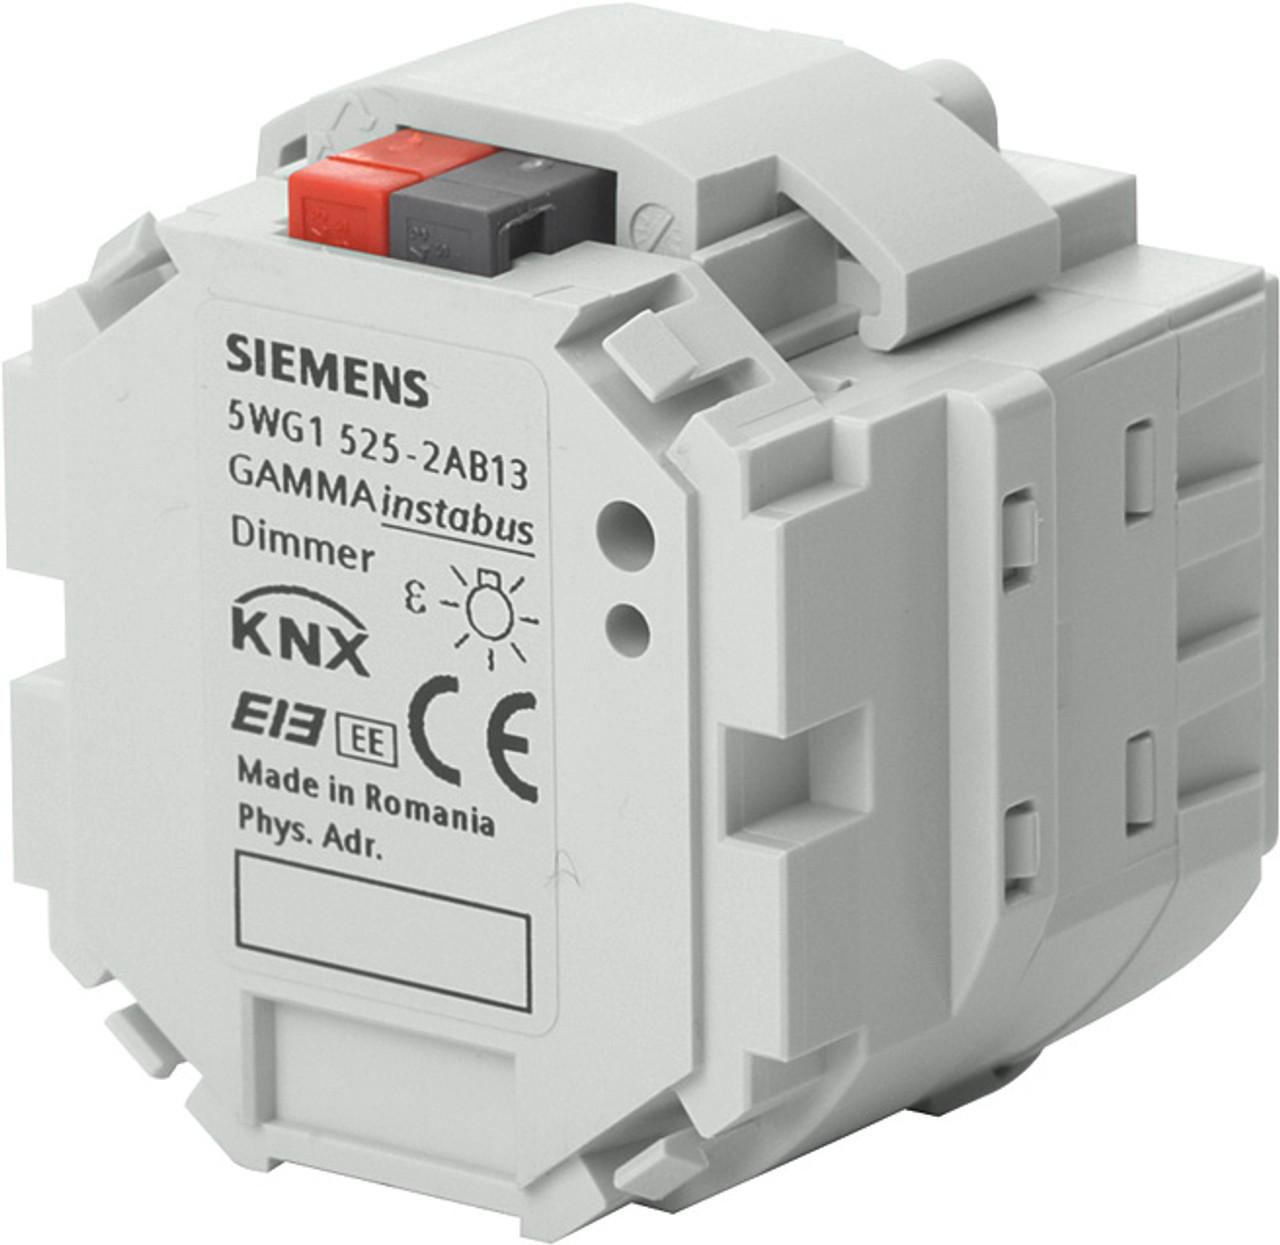 Siemens 5WG1525-2AB13